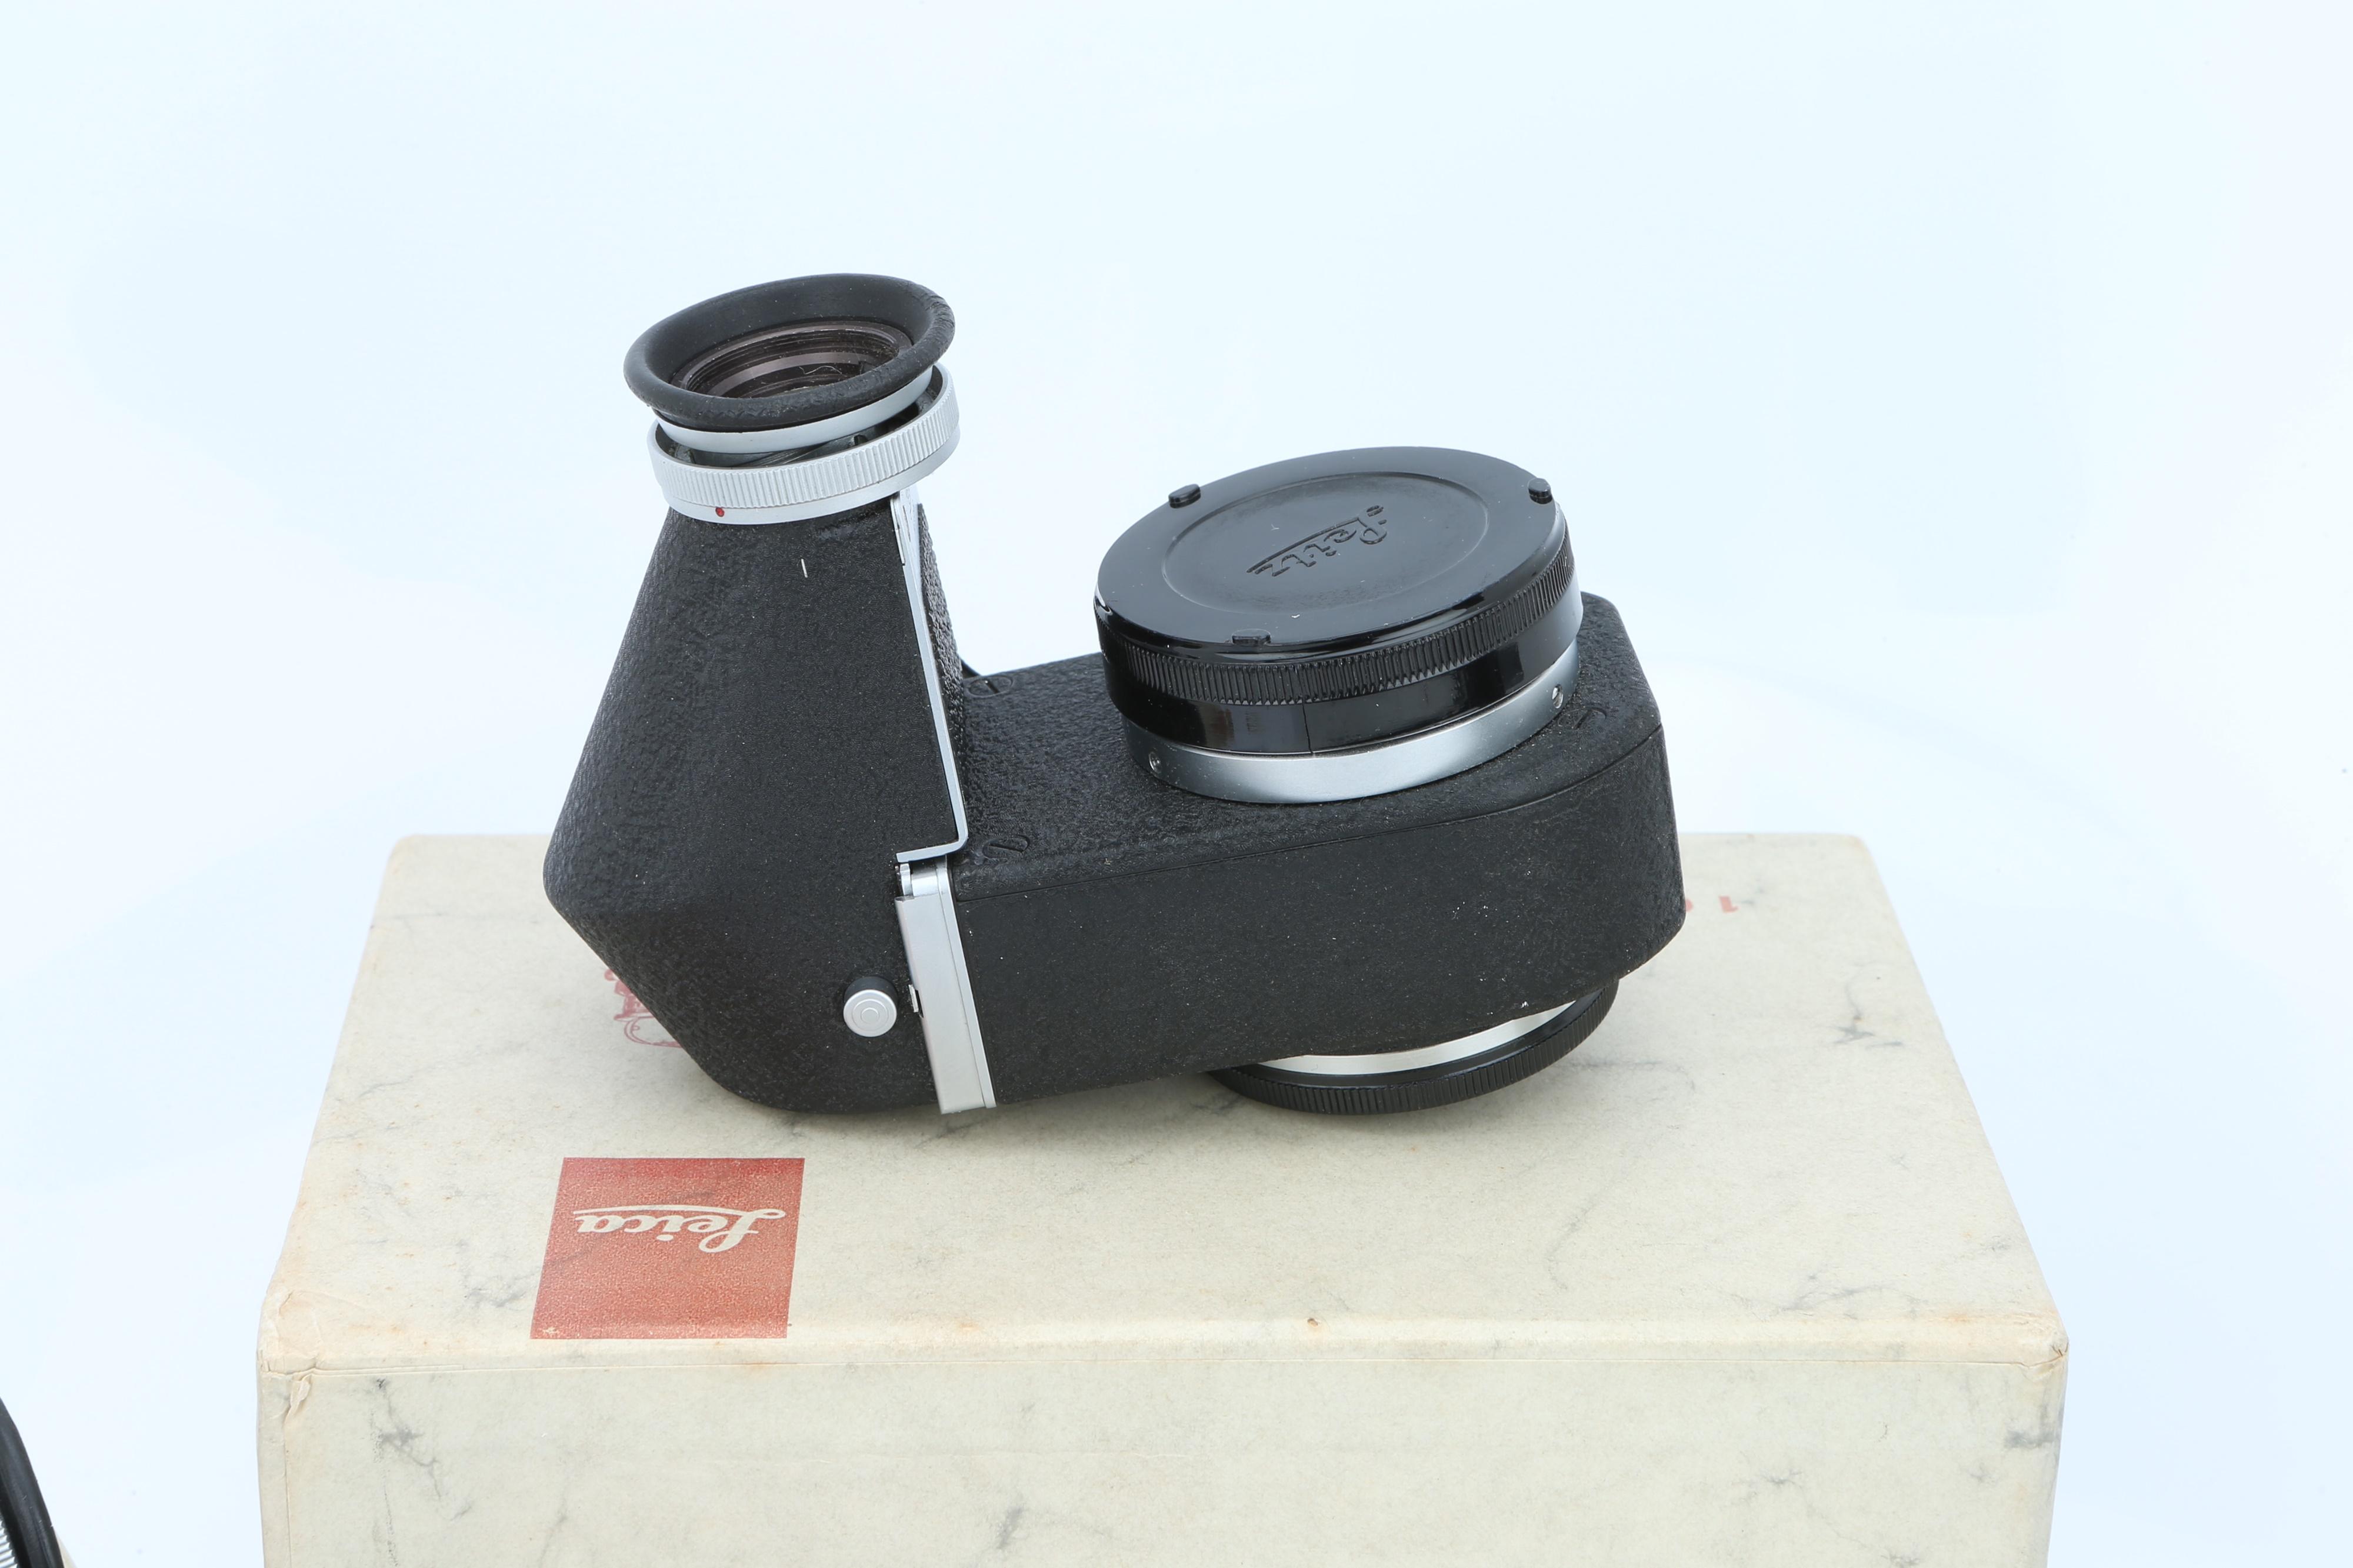 A Selection of Leica Visoflex Equipment, - Image 3 of 4